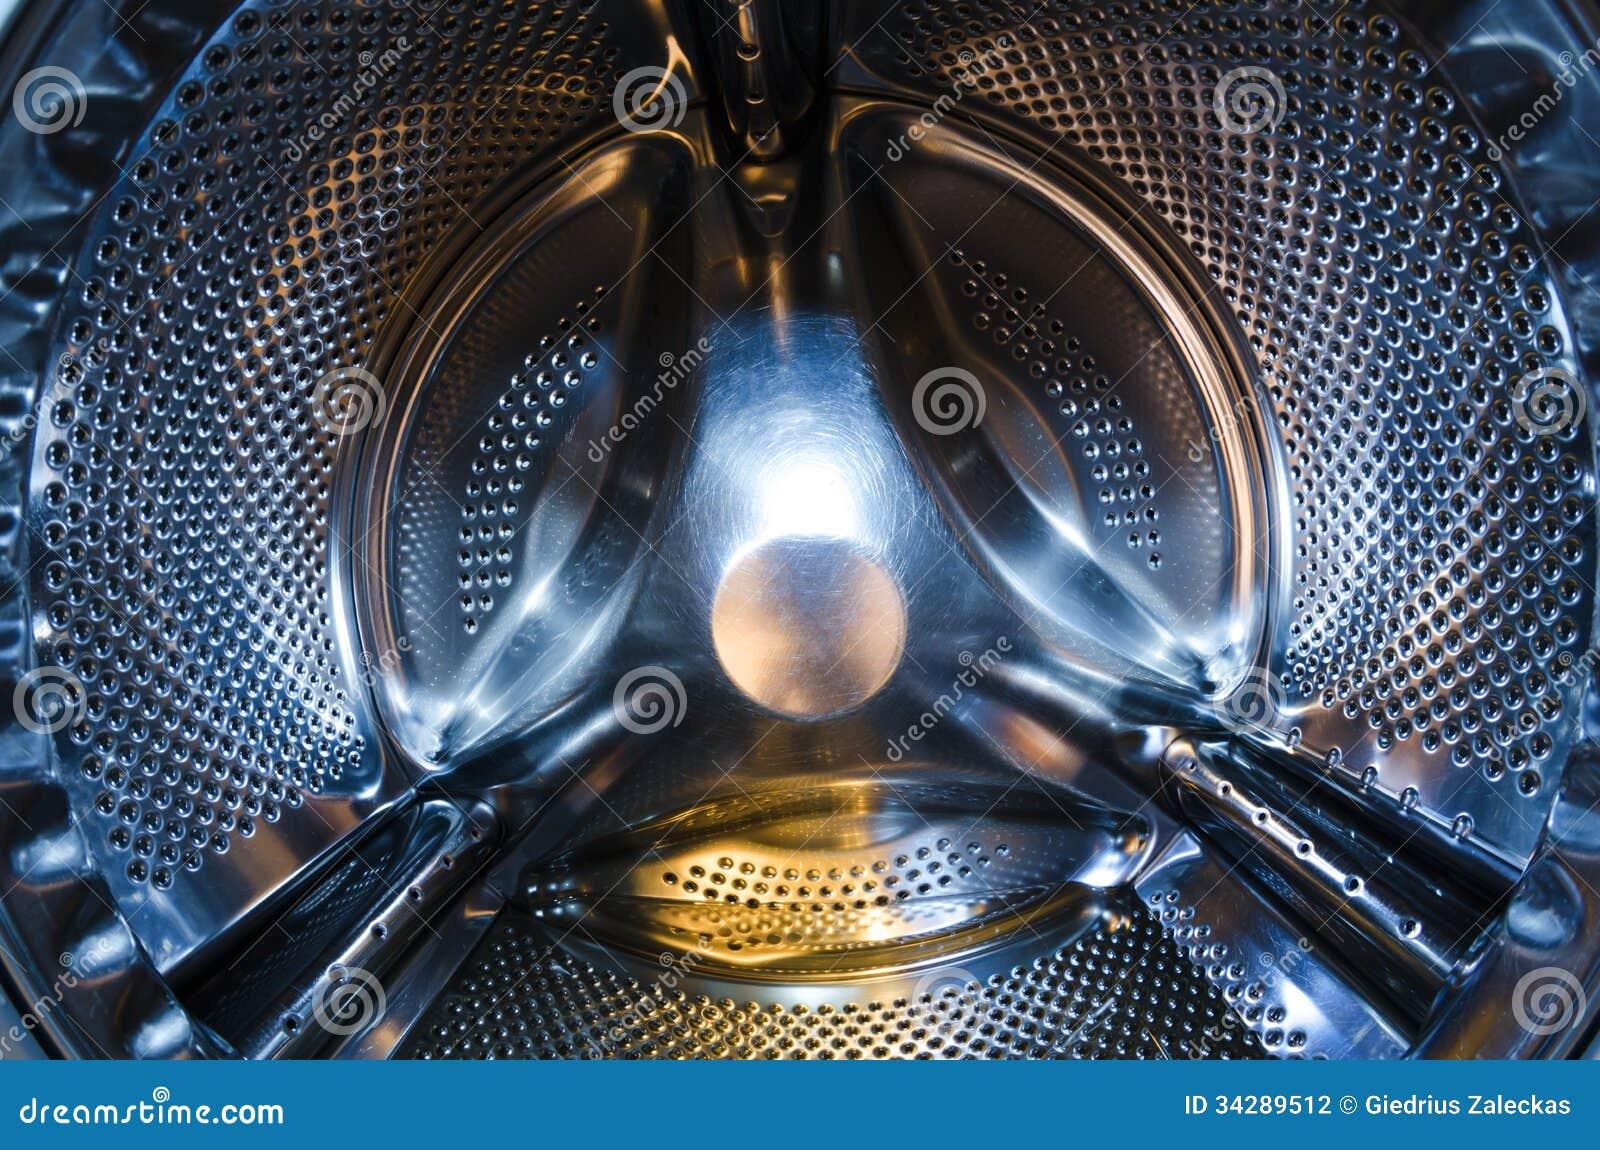 washing machine drum stock photo image of steel chrome 34289512. Black Bedroom Furniture Sets. Home Design Ideas